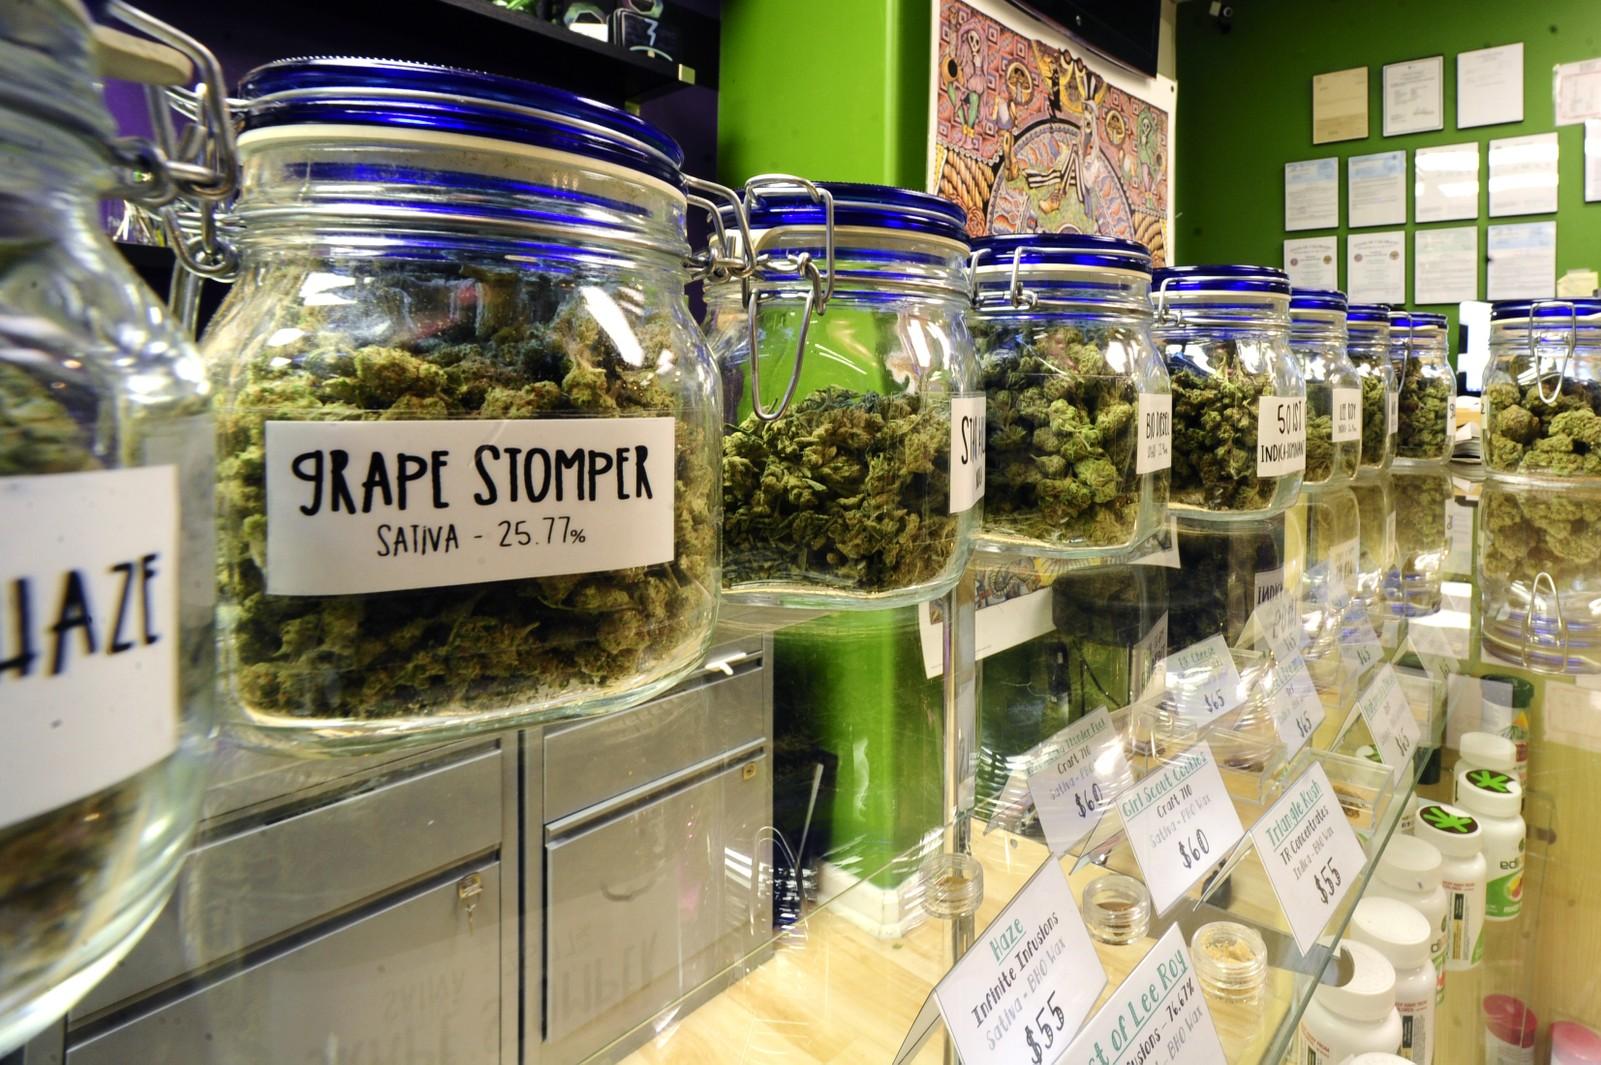 USA Marijuana Dispensaries Email List and How It Can Help Cannabis Companies